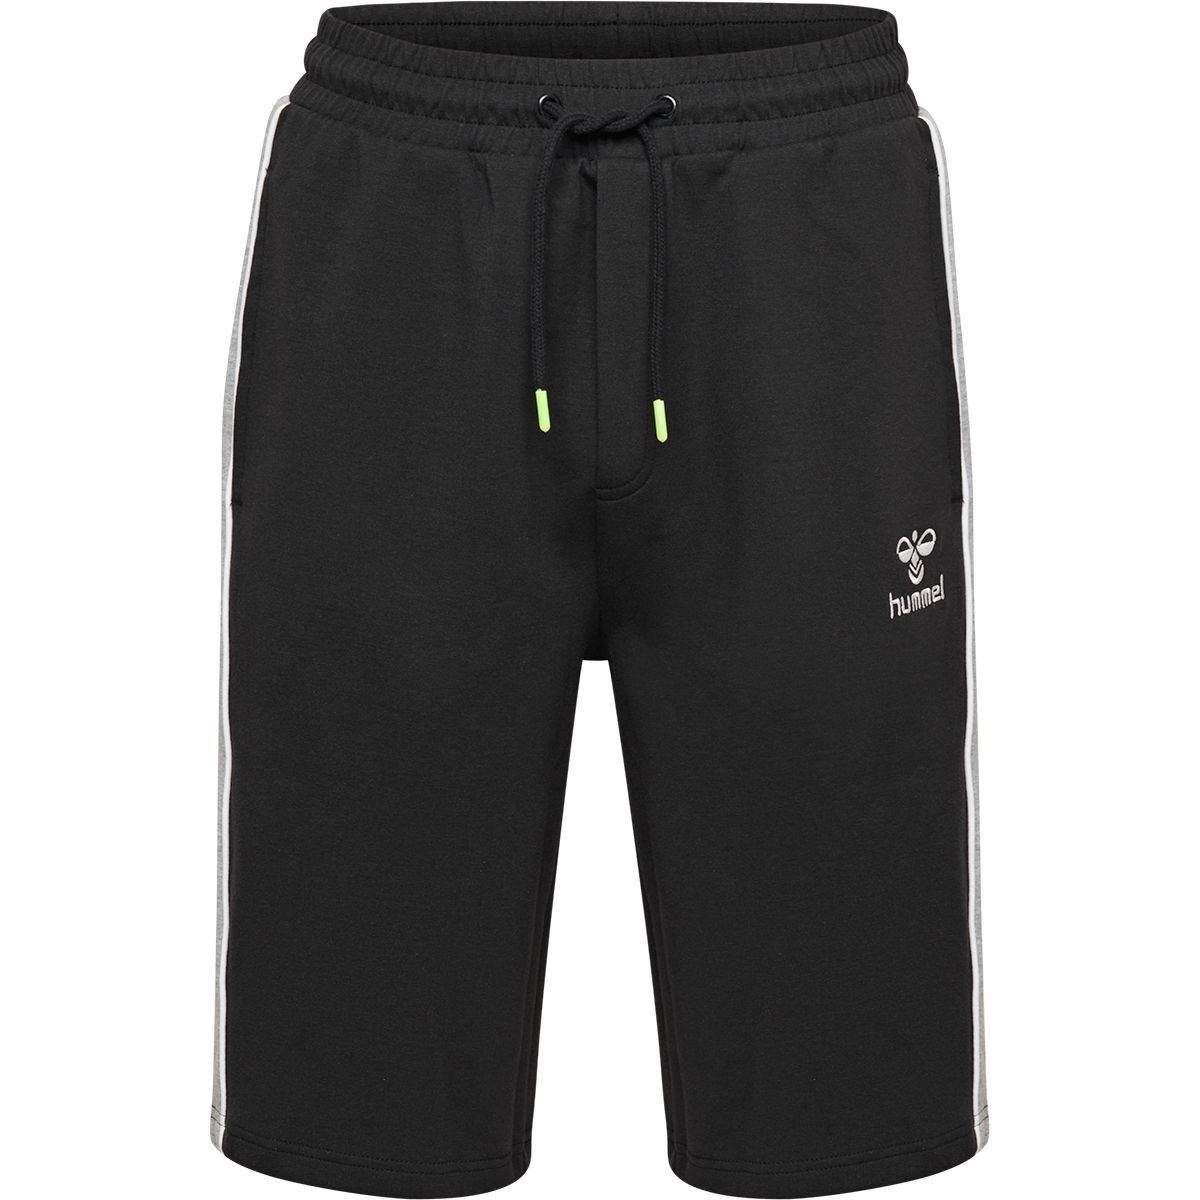 Hummel Layton shorts